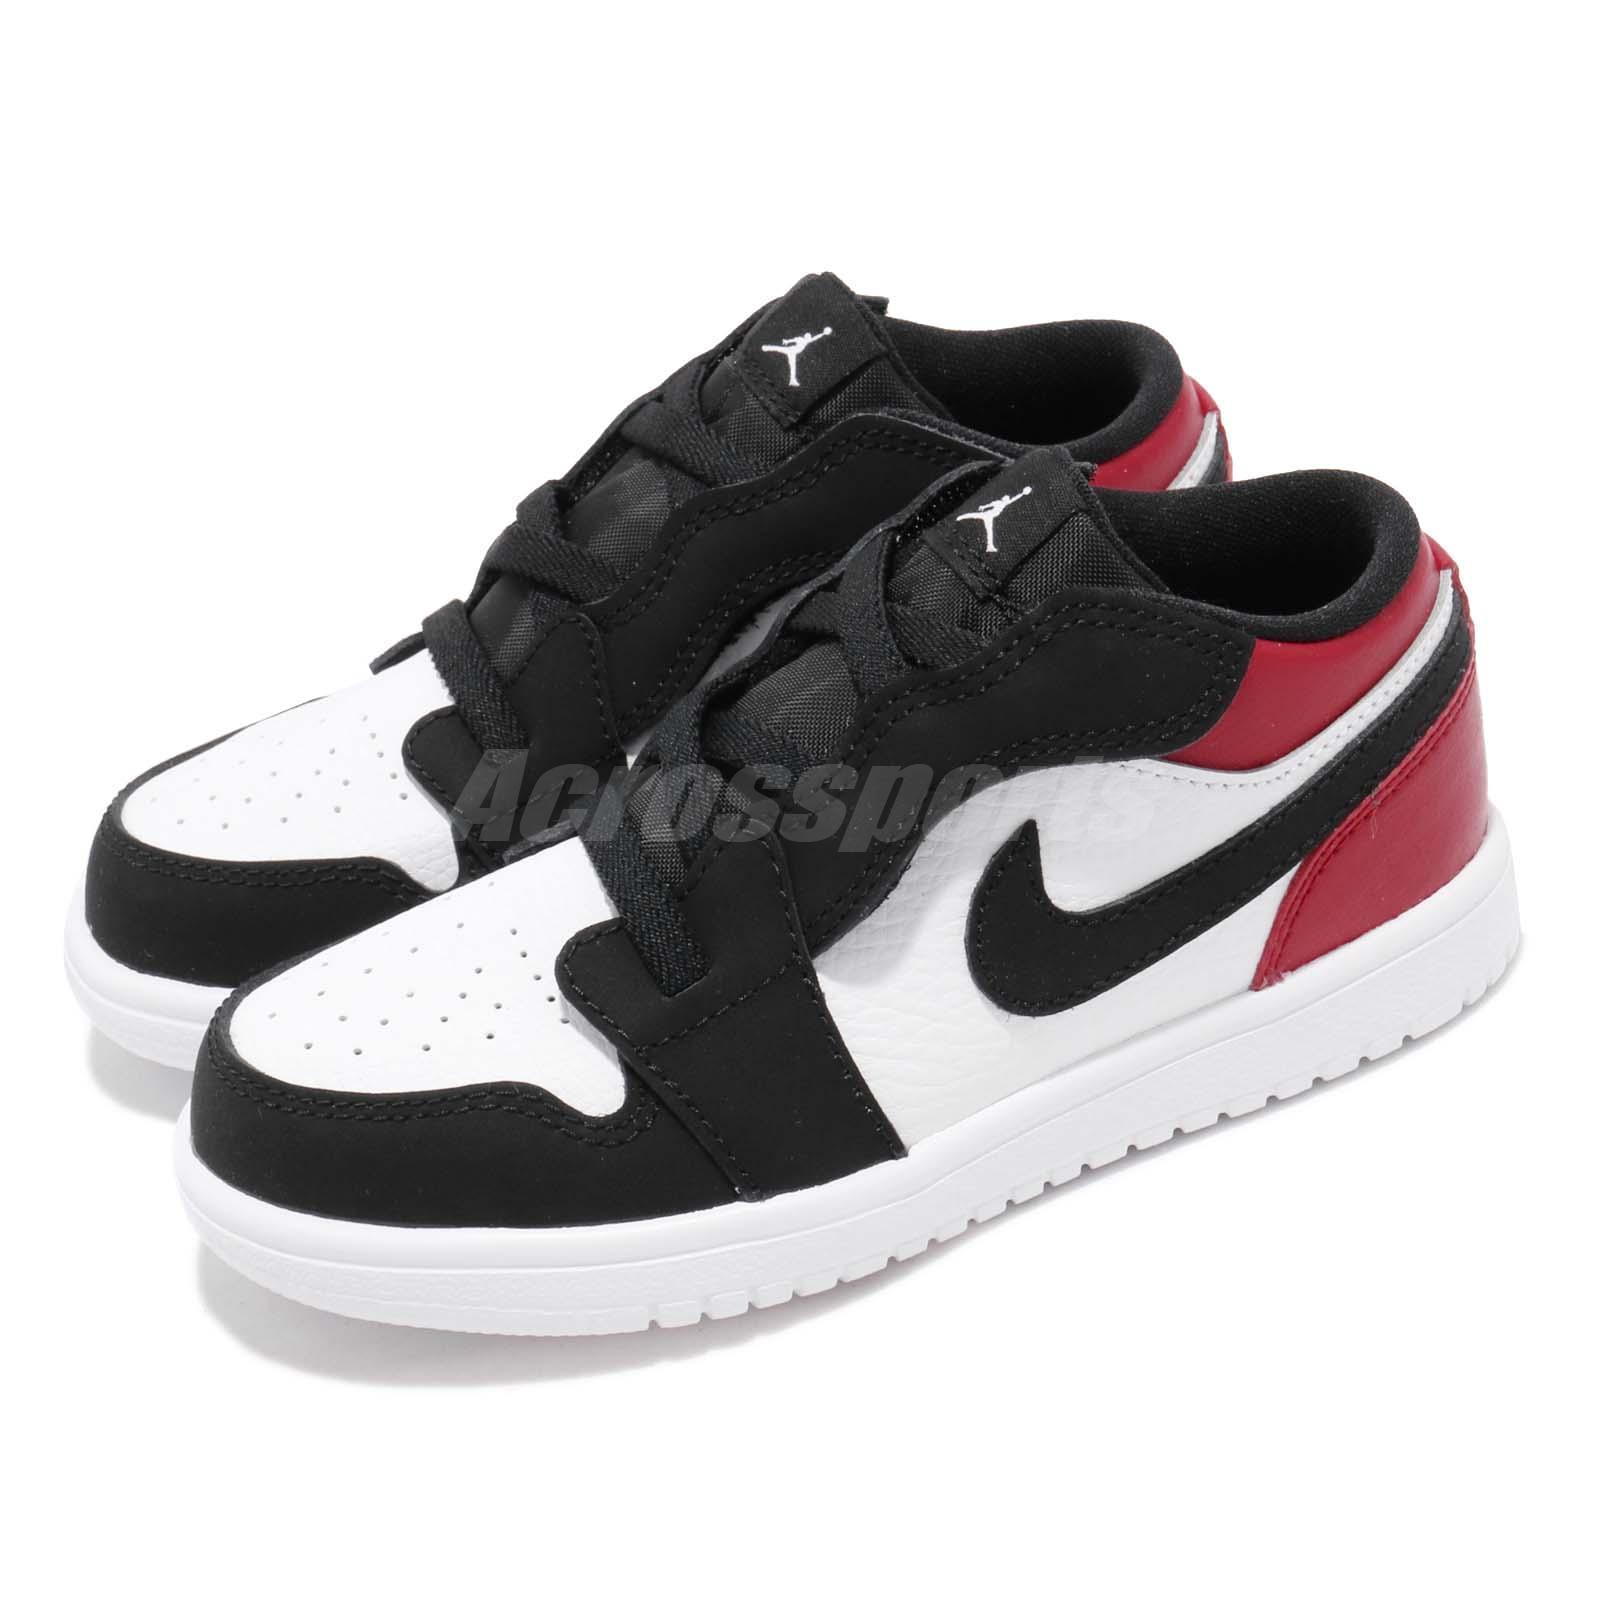 cheap for discount 8a4a7 424ba Details about Nike Jordan 1 Low ALT TD I AJ1 Black Toe Red Toddler Infant  Shoes CI3436-116